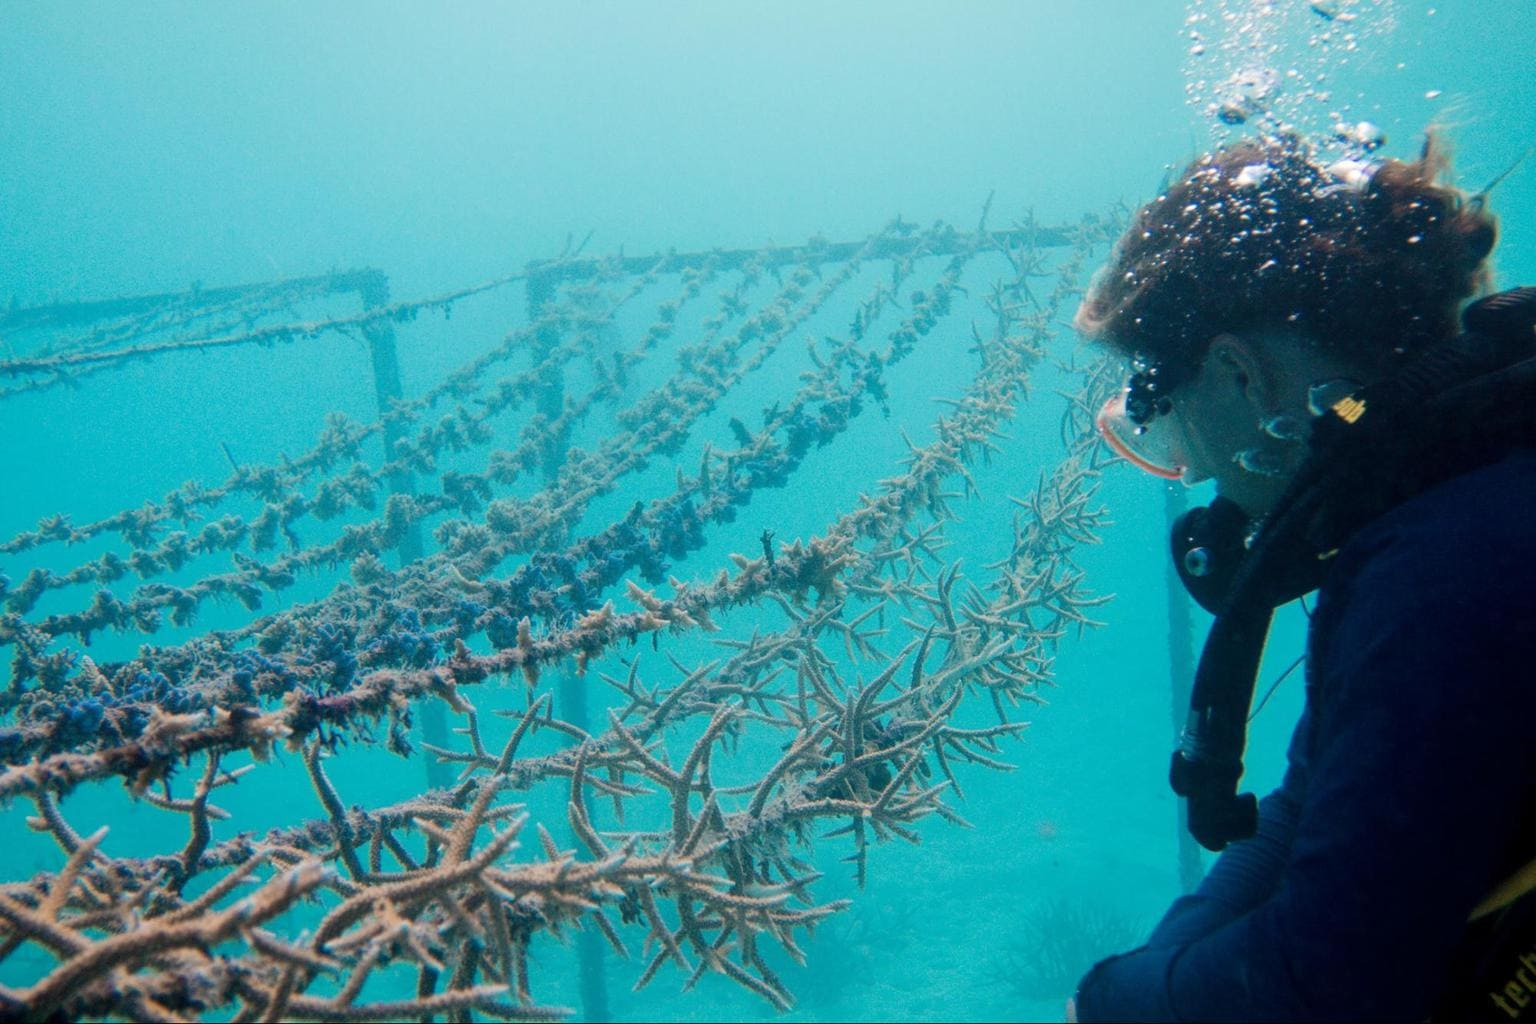 Coral lines at Gili Lankanfushi - Courtesy of Gili Lankanfushi